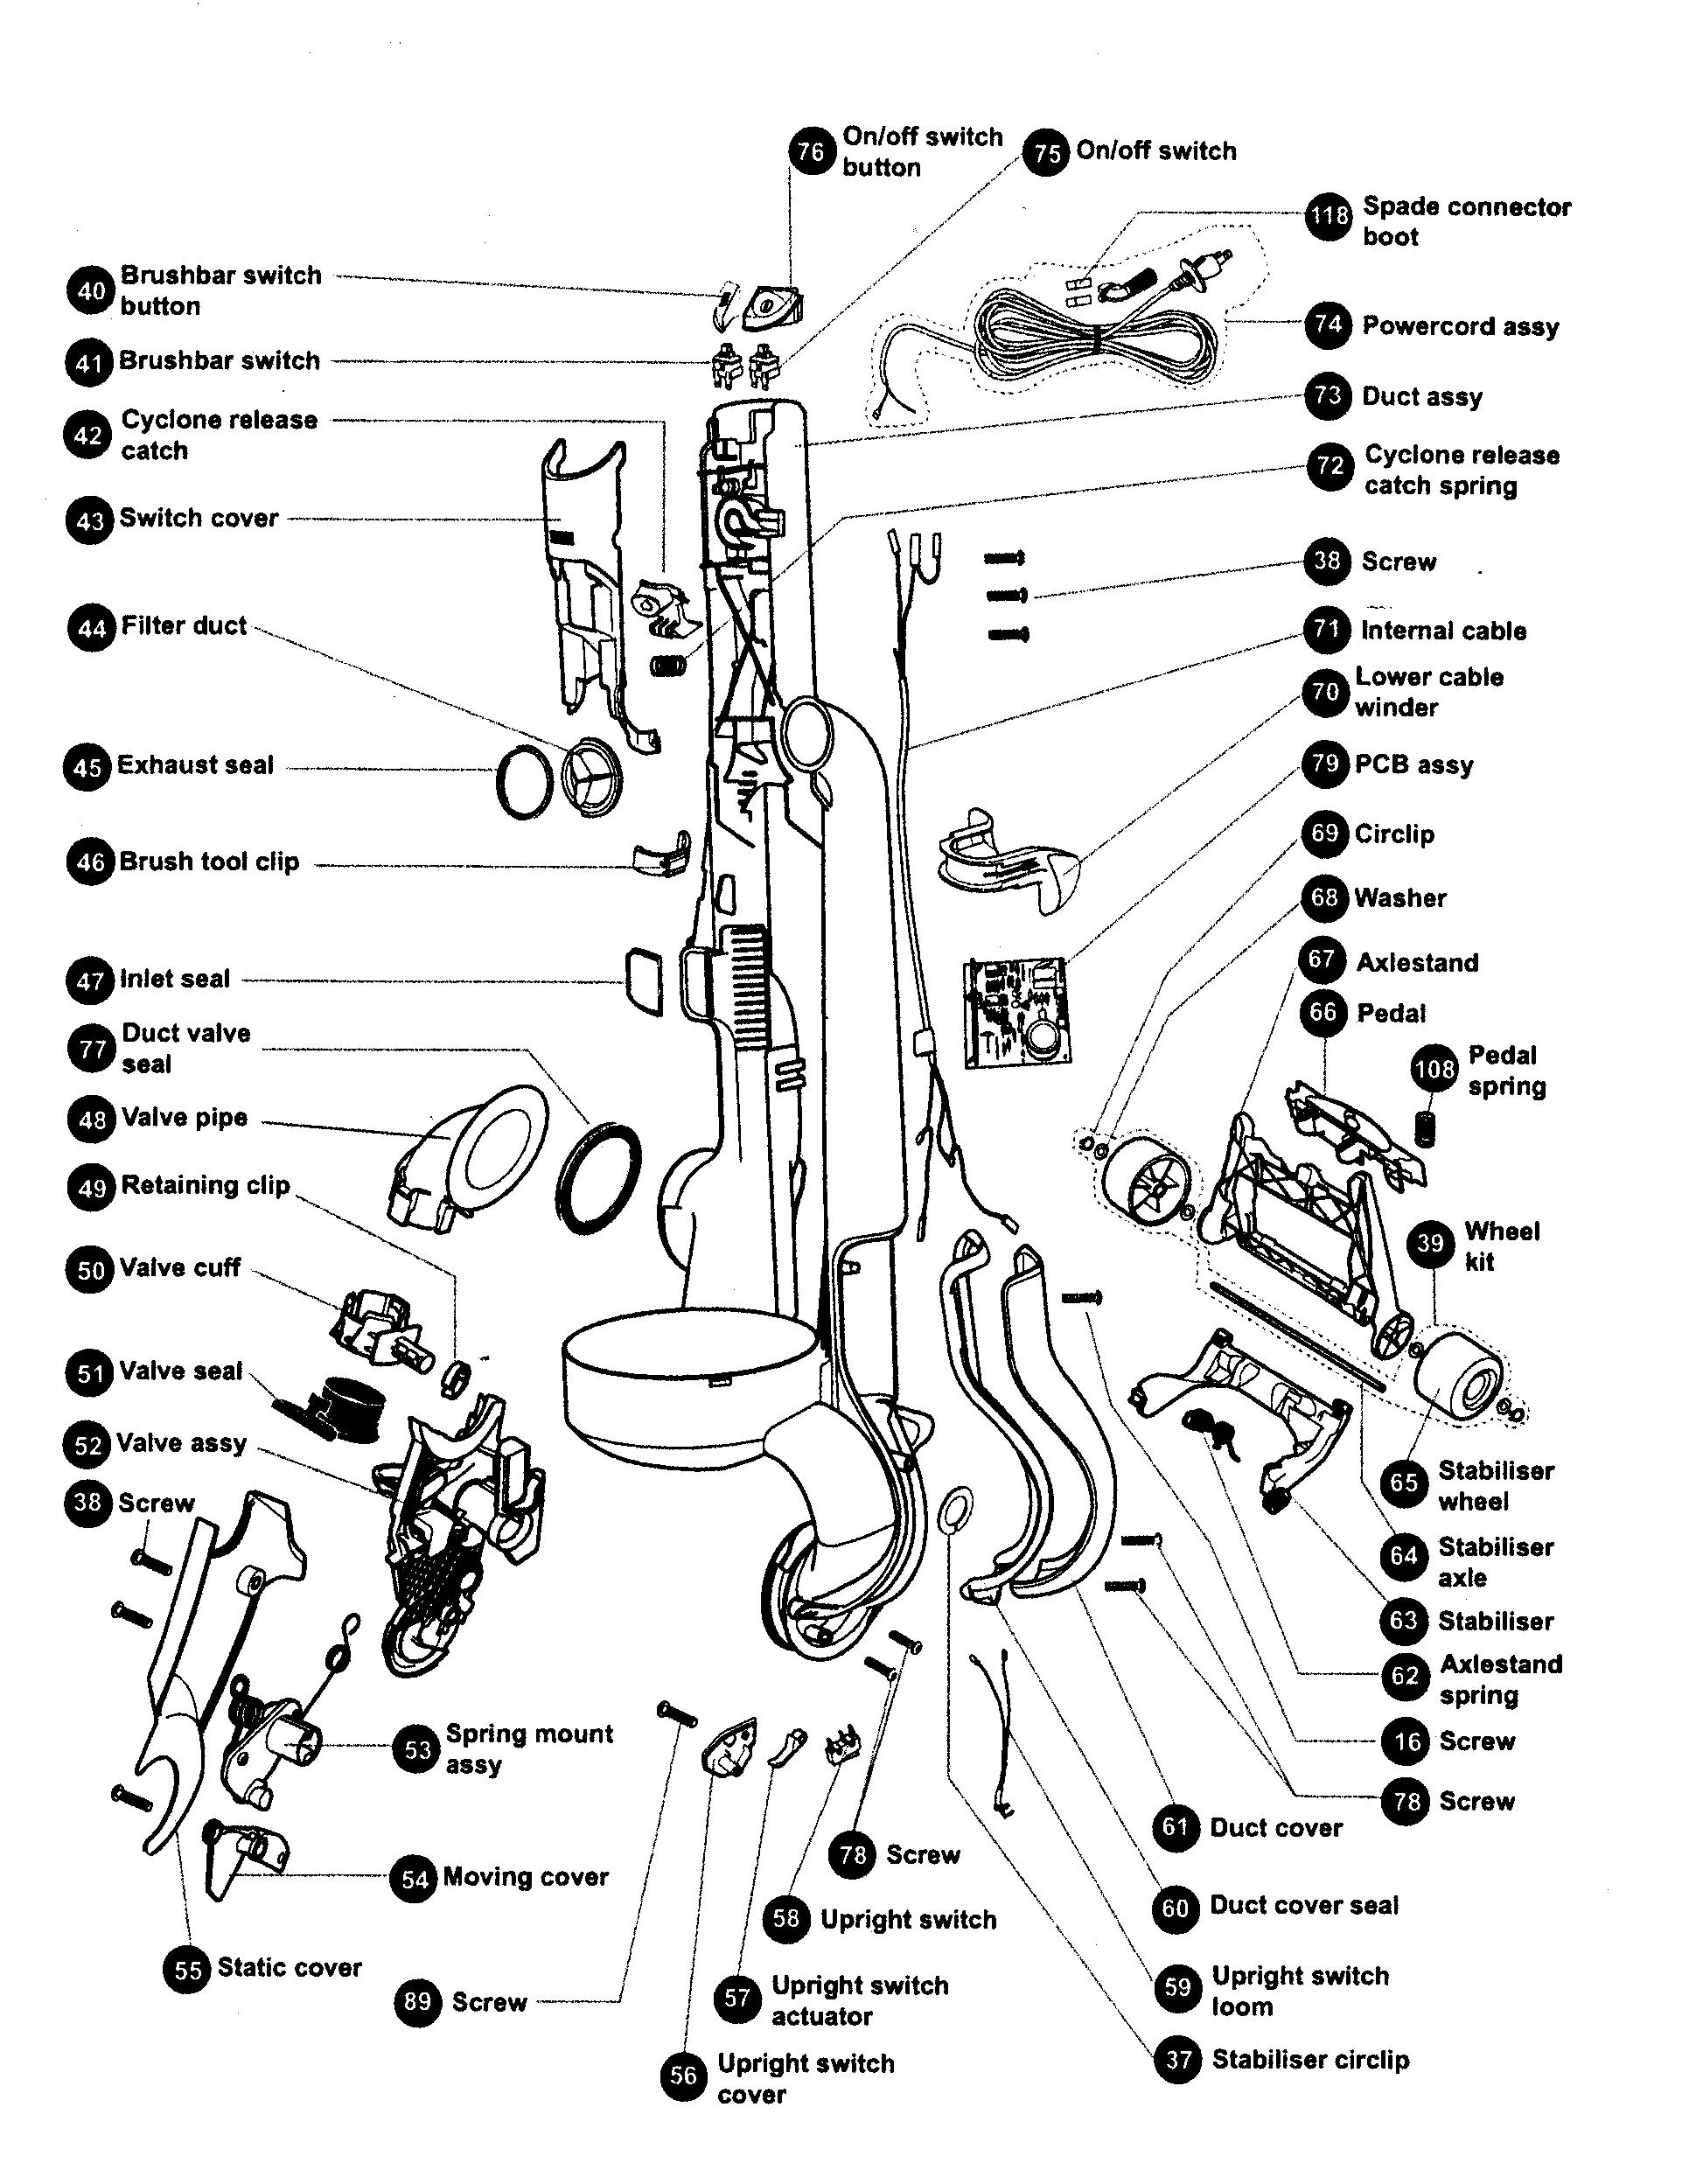 dyson vacuum cleaner wiring diagram